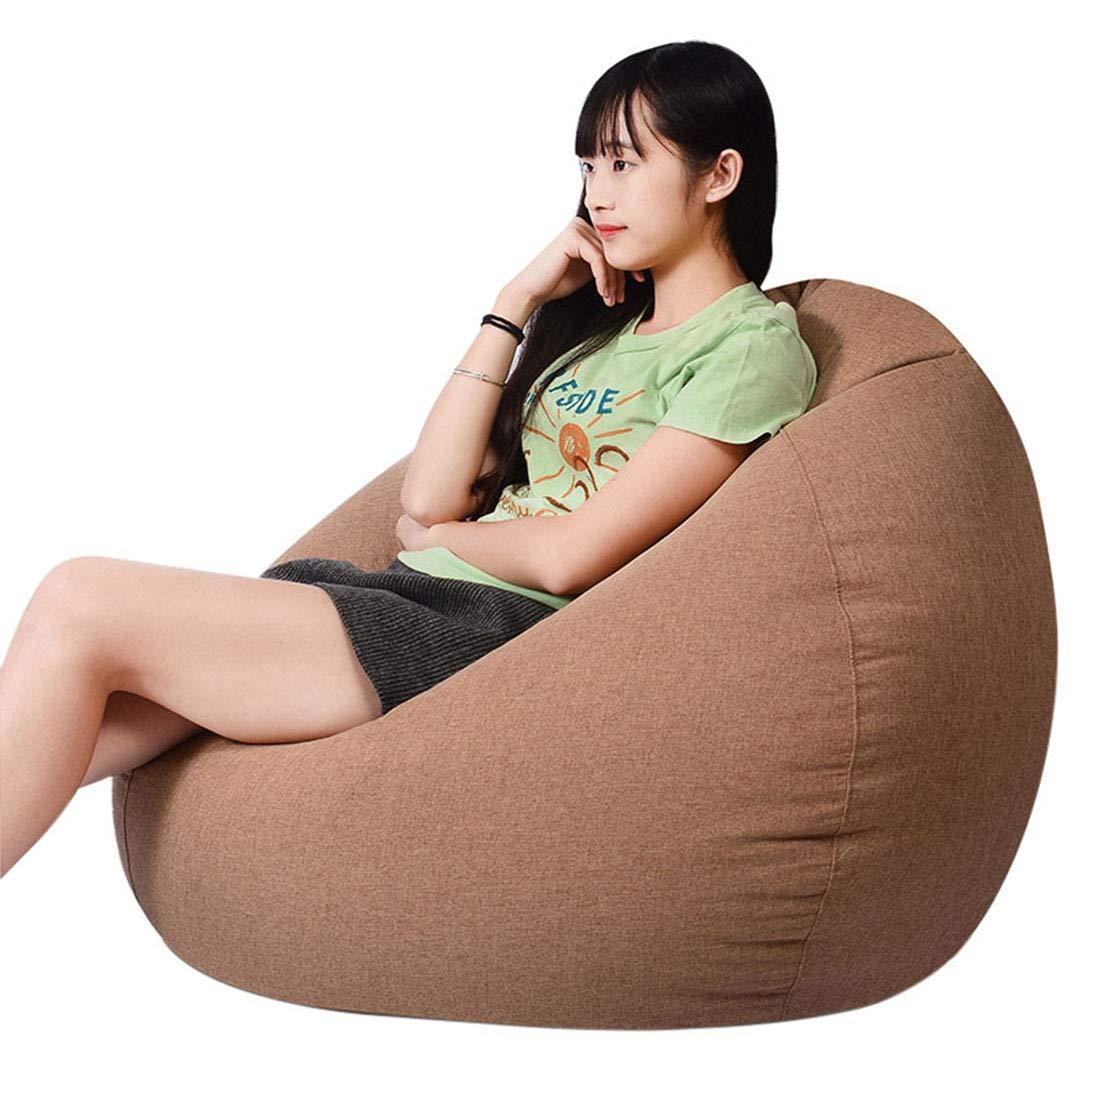 Jiyaru Bean Bag Chair for Kids Adults Lazy Sofa Seat Cushion Washable Beanbag Newspaper S